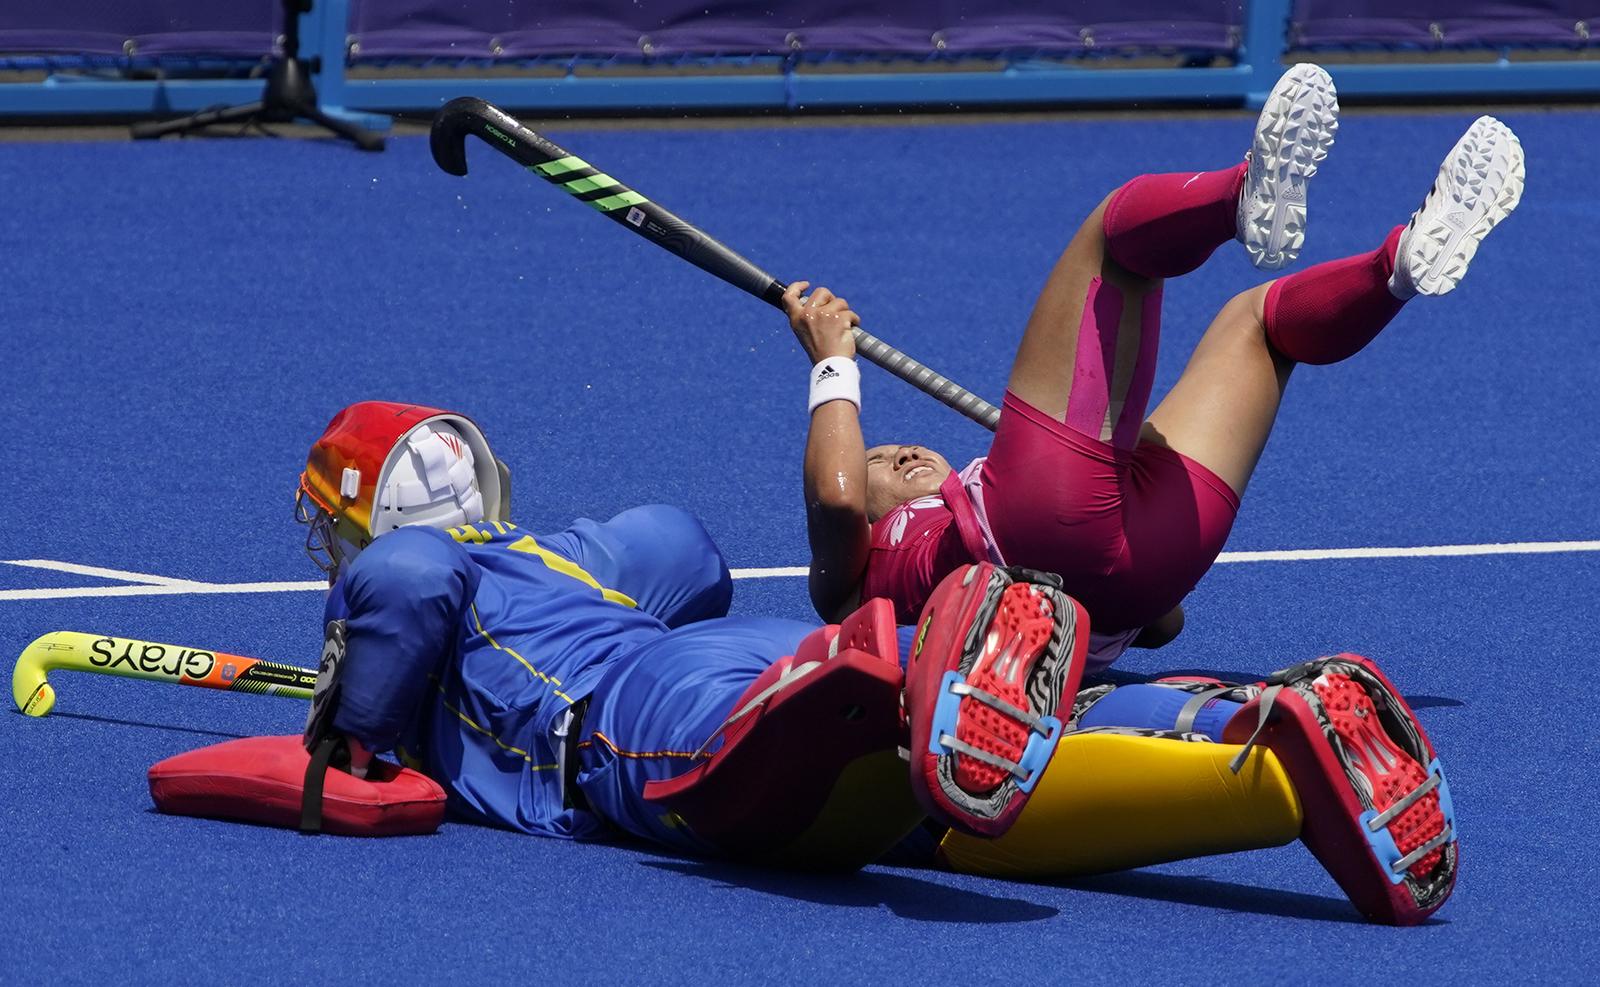 Spain's goalkeeper Maria de los Angeles Ruiz Castillo (1) blocks a shot attempt by Japan's Yuri Nagai (9) during a women's field hockey match at the 2020 Summer Olympics, Saturday, July 31, 2021, in Tokyo, Japan. AP